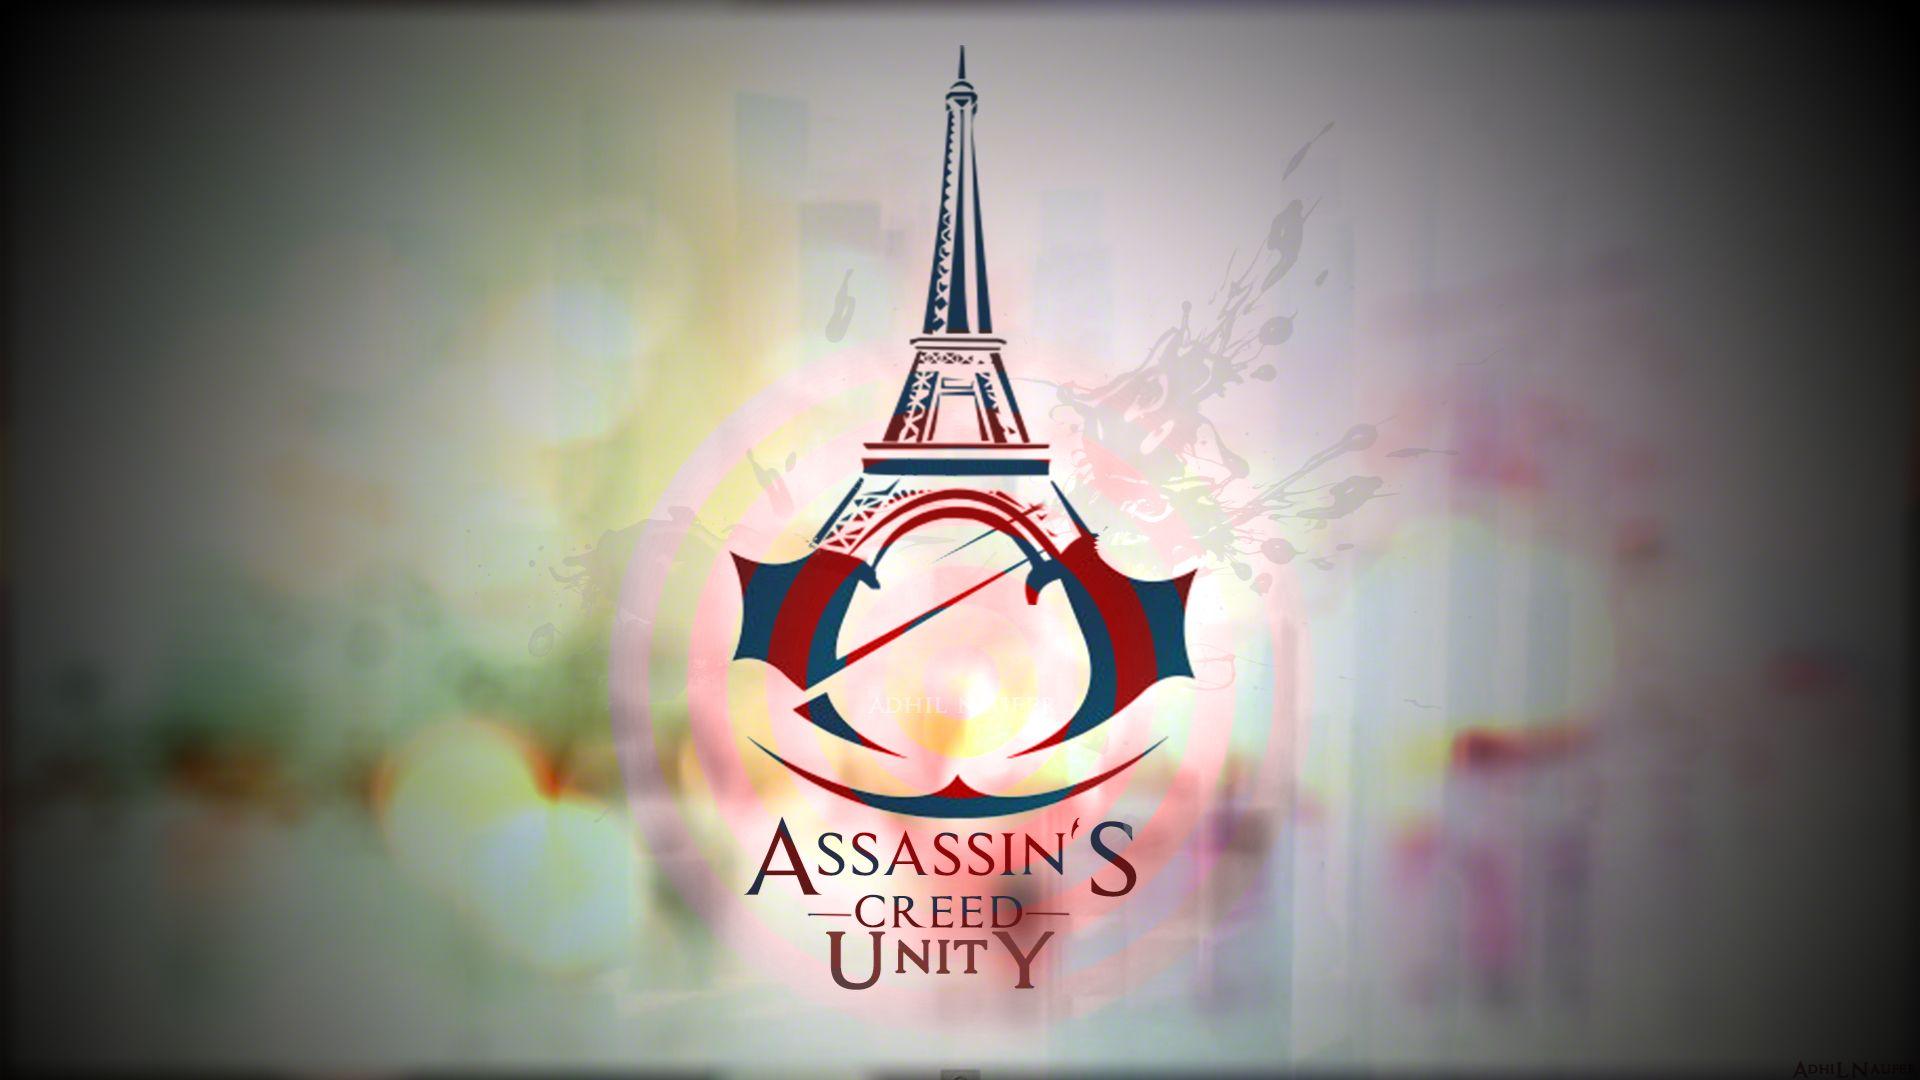 assassins creed unity logo wallpaper